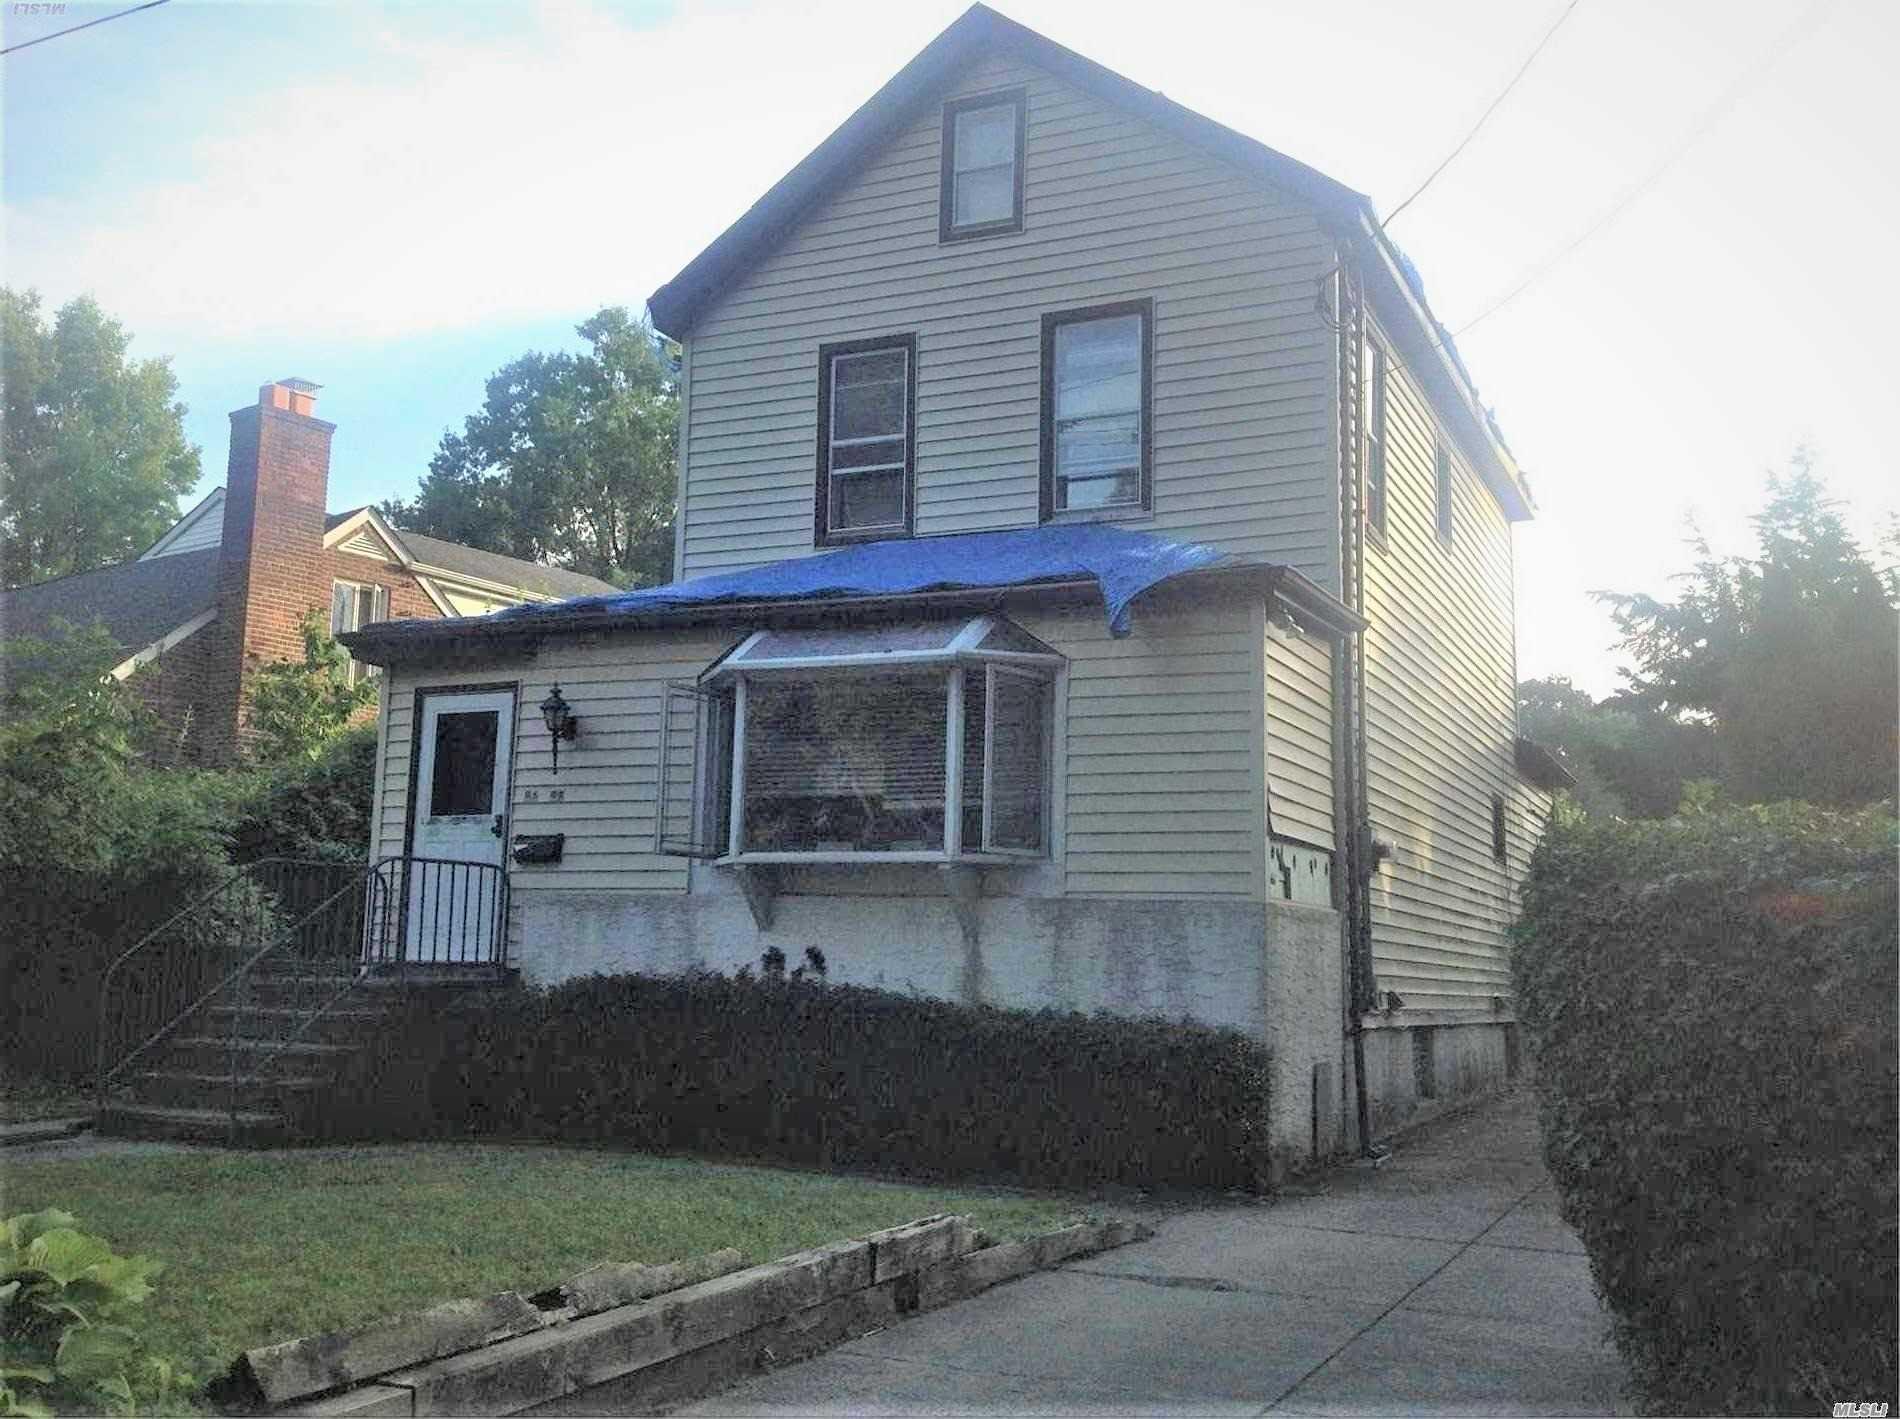 86-98 Sancho St Holliswood, NY 11423